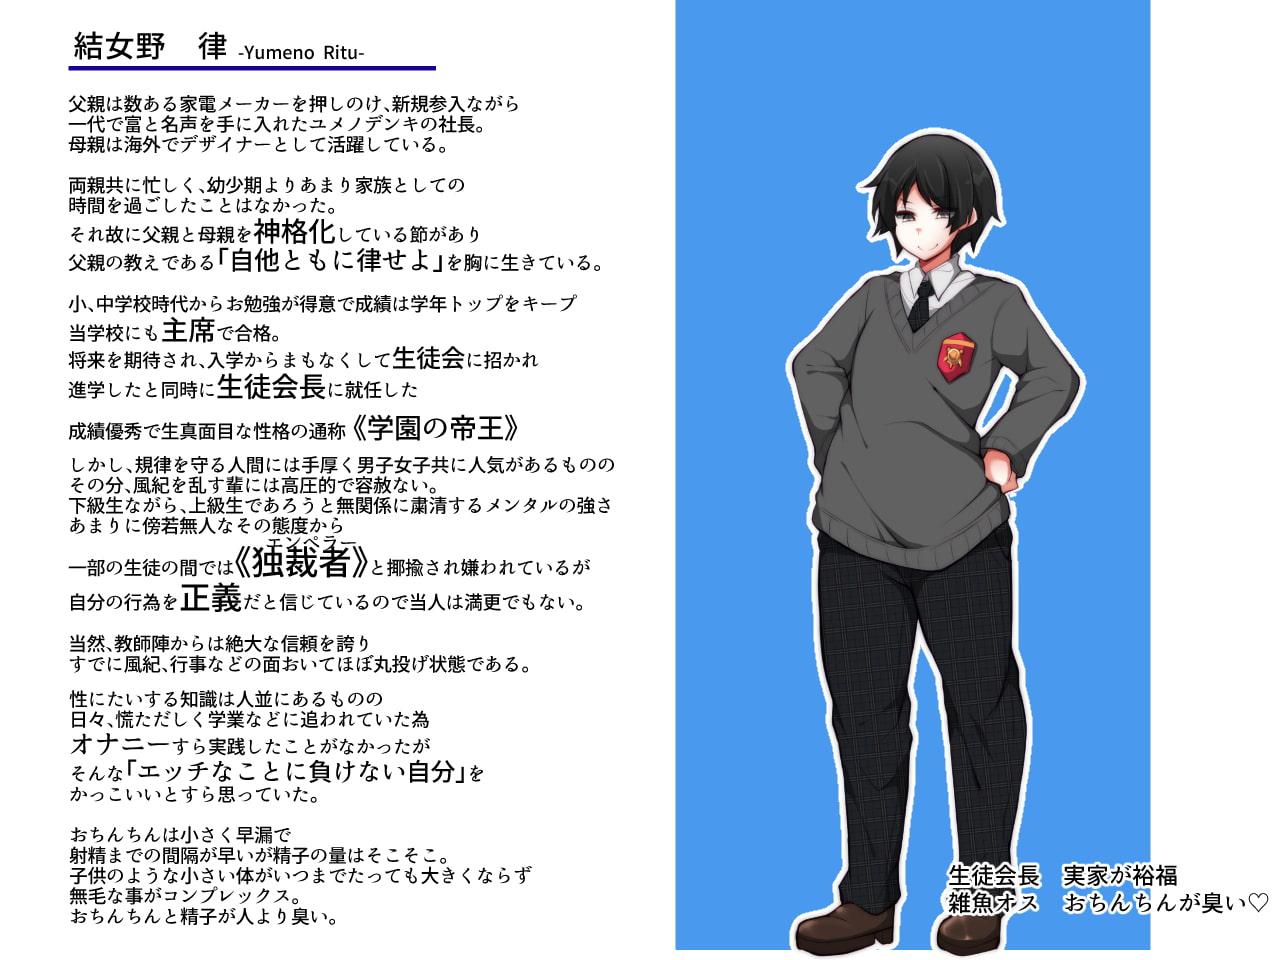 FUTAGO NO SHIWAZA 彼女のおせわは彼氏の義務ですよ?